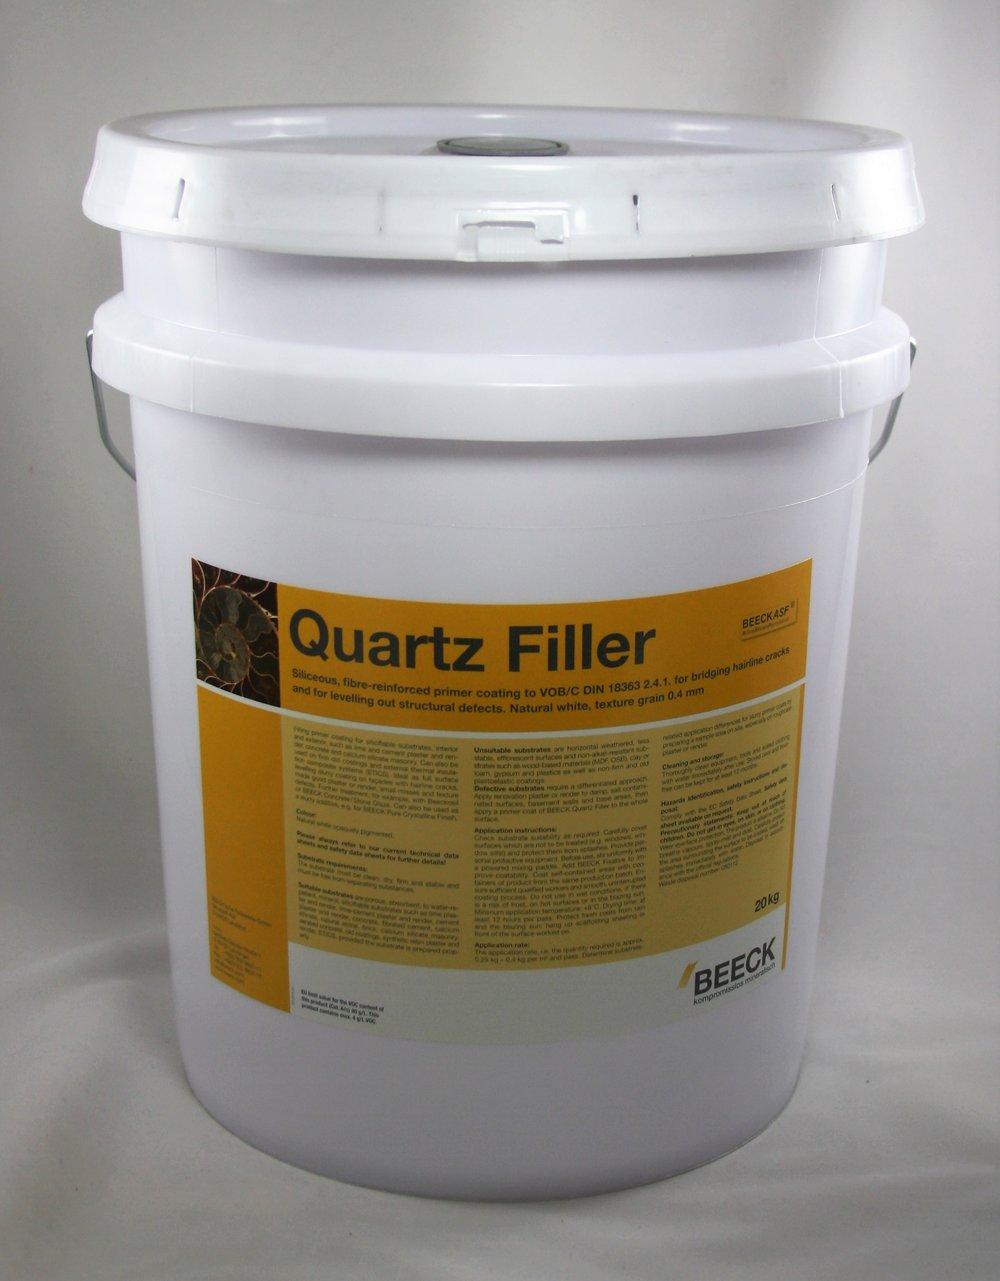 BEECK Quartz Filler 20kg.jpg